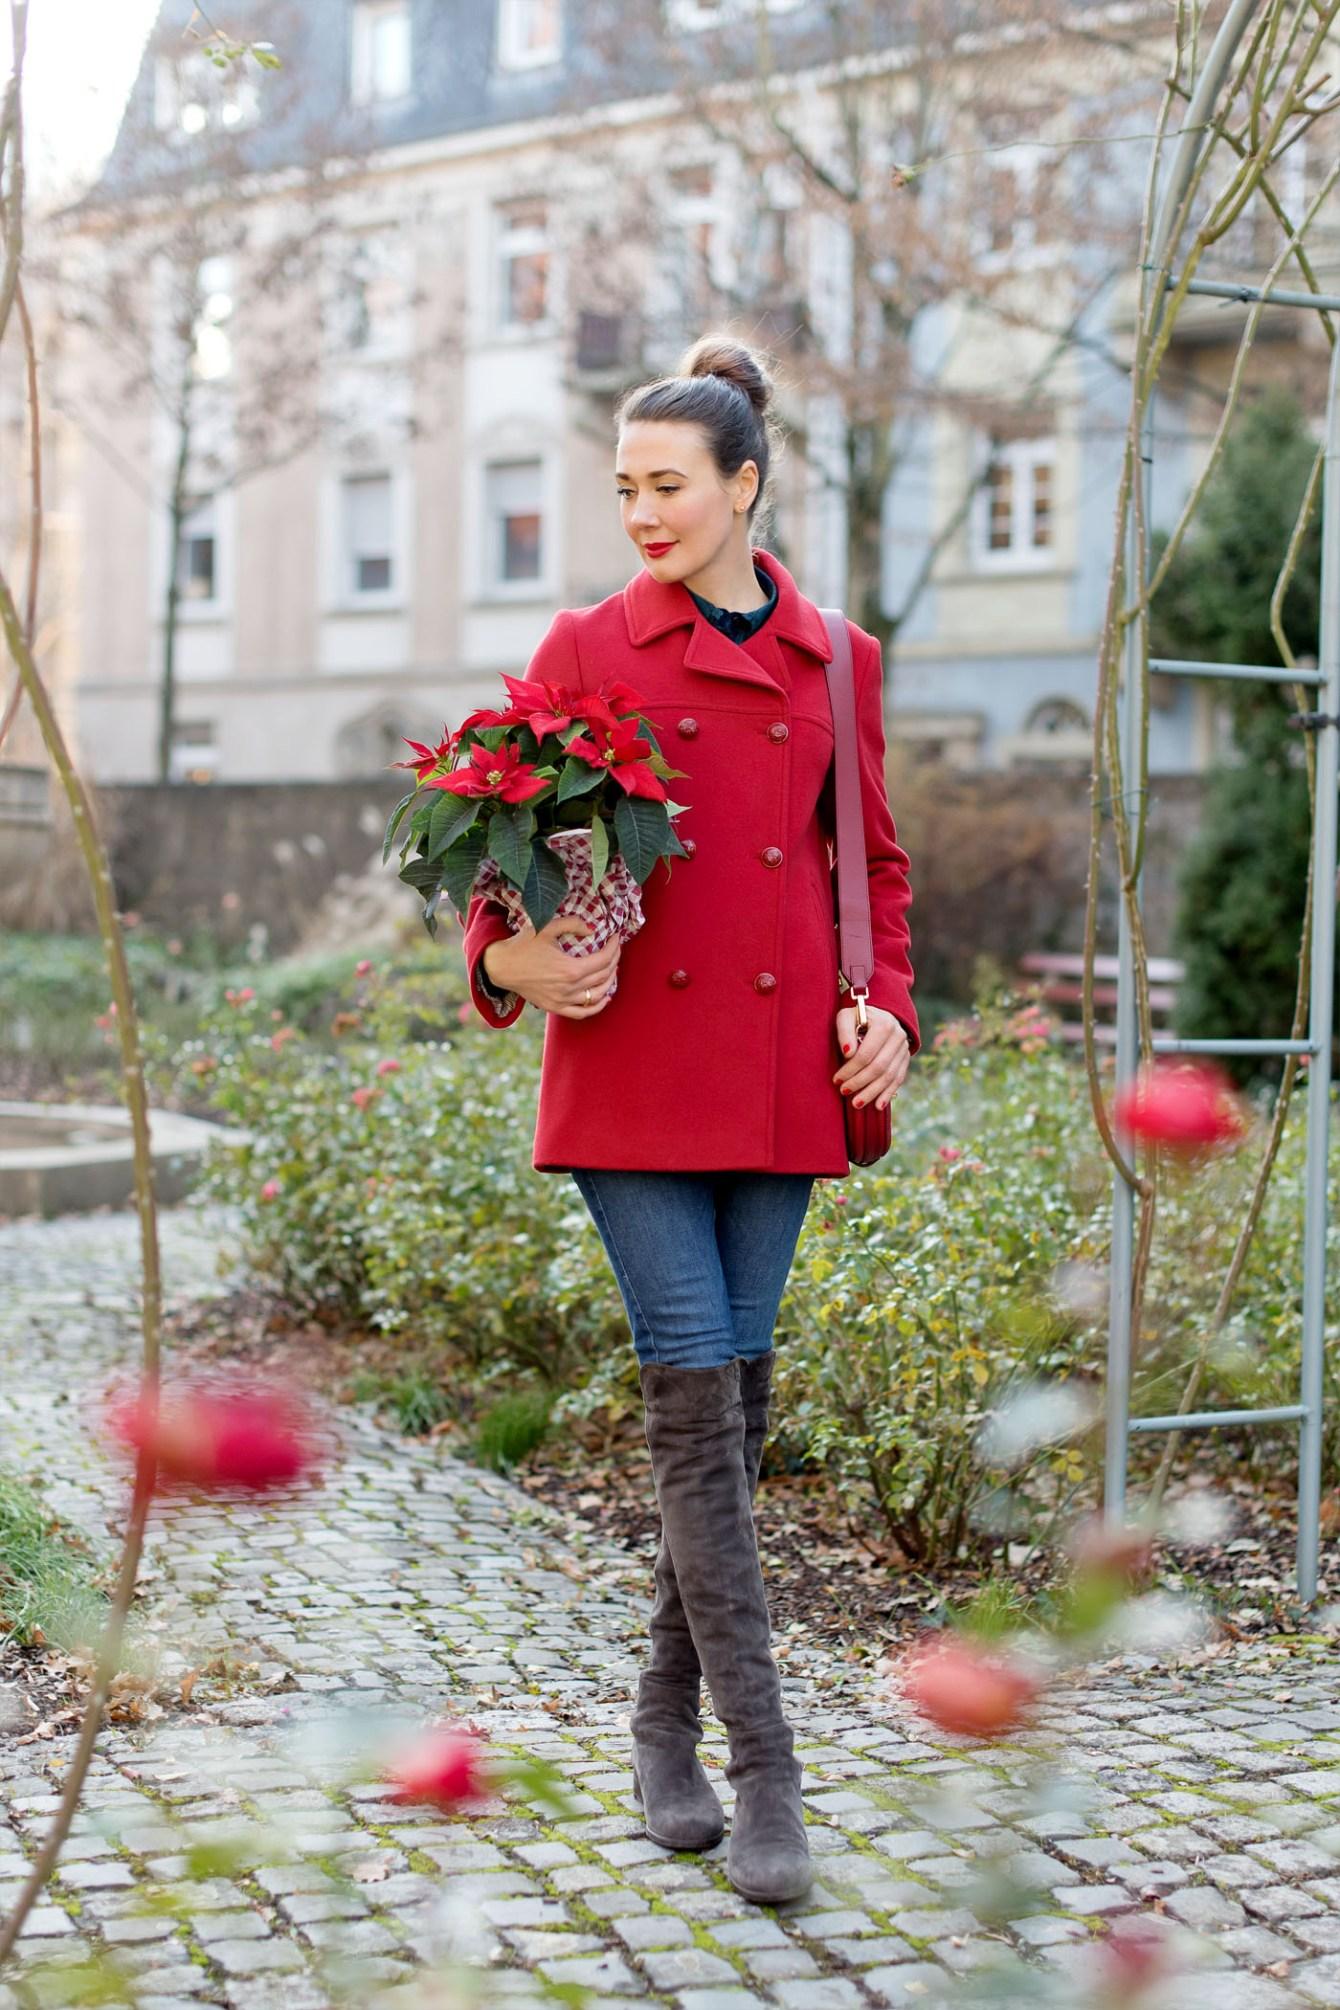 red-woolcoat-armor-lux-wollmantel-stuart-weitzman-overknee-boots-furla-bag-holidays-fashion